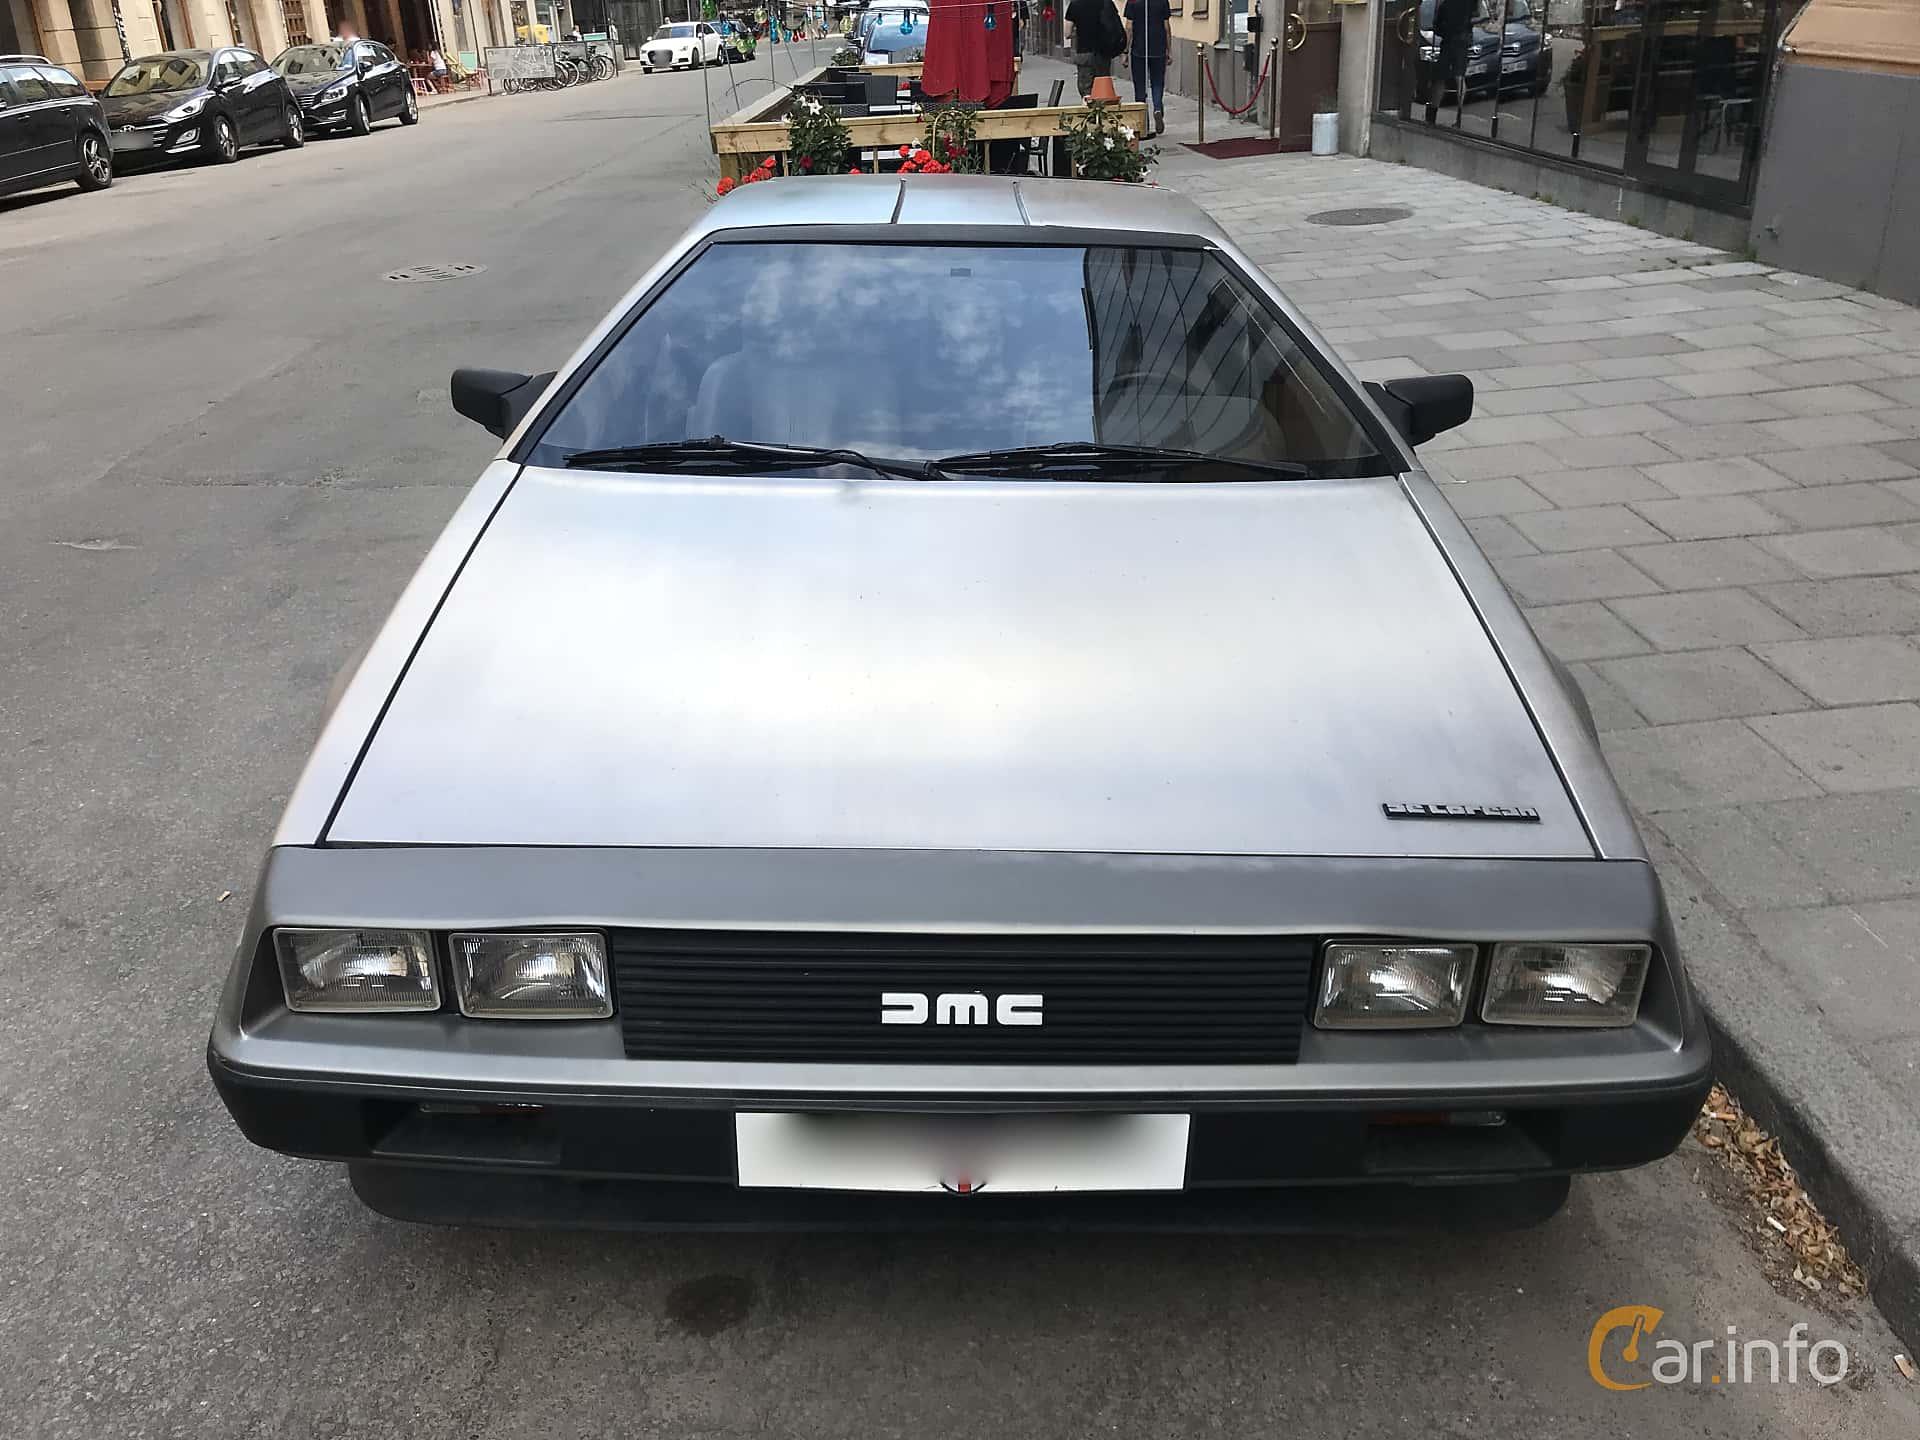 Fram av DeLorean DMC-12 2.8 V6 Automatic, 132ps, 1982